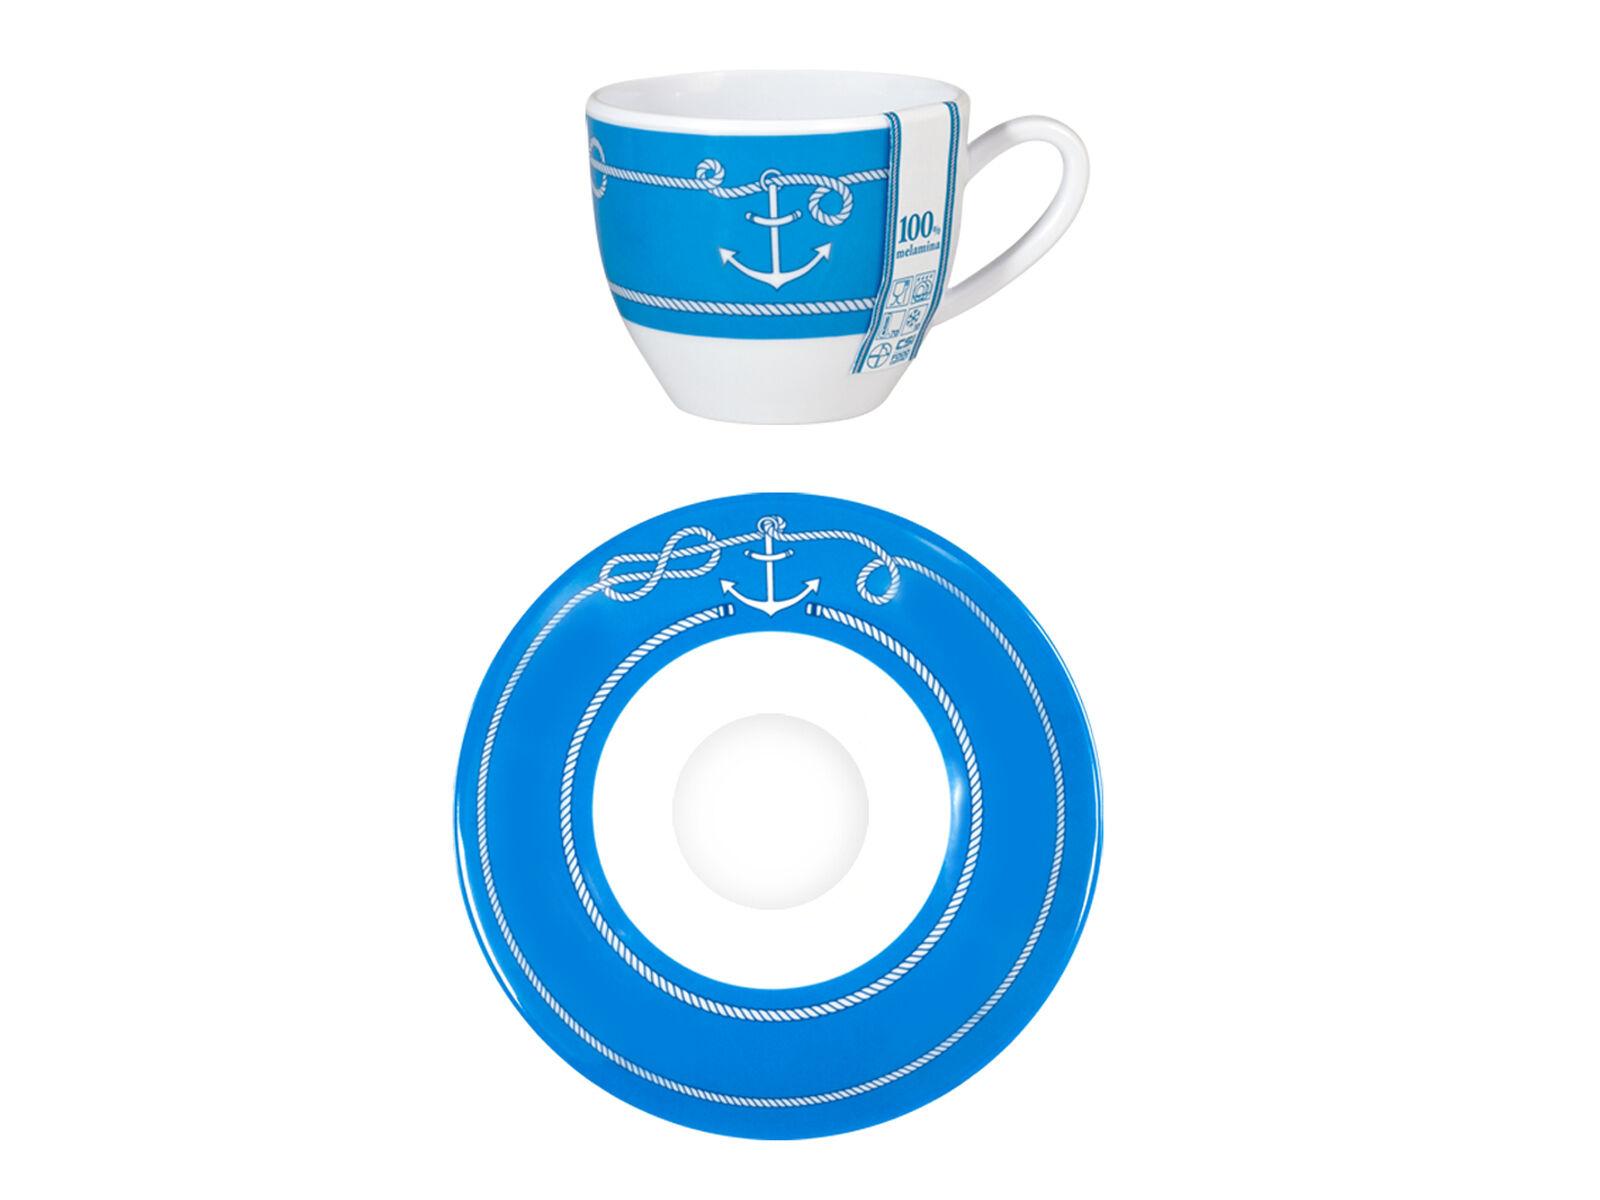 H&H Set 6 Tazze Caffè Melamina Marina Con Piatti Colazione